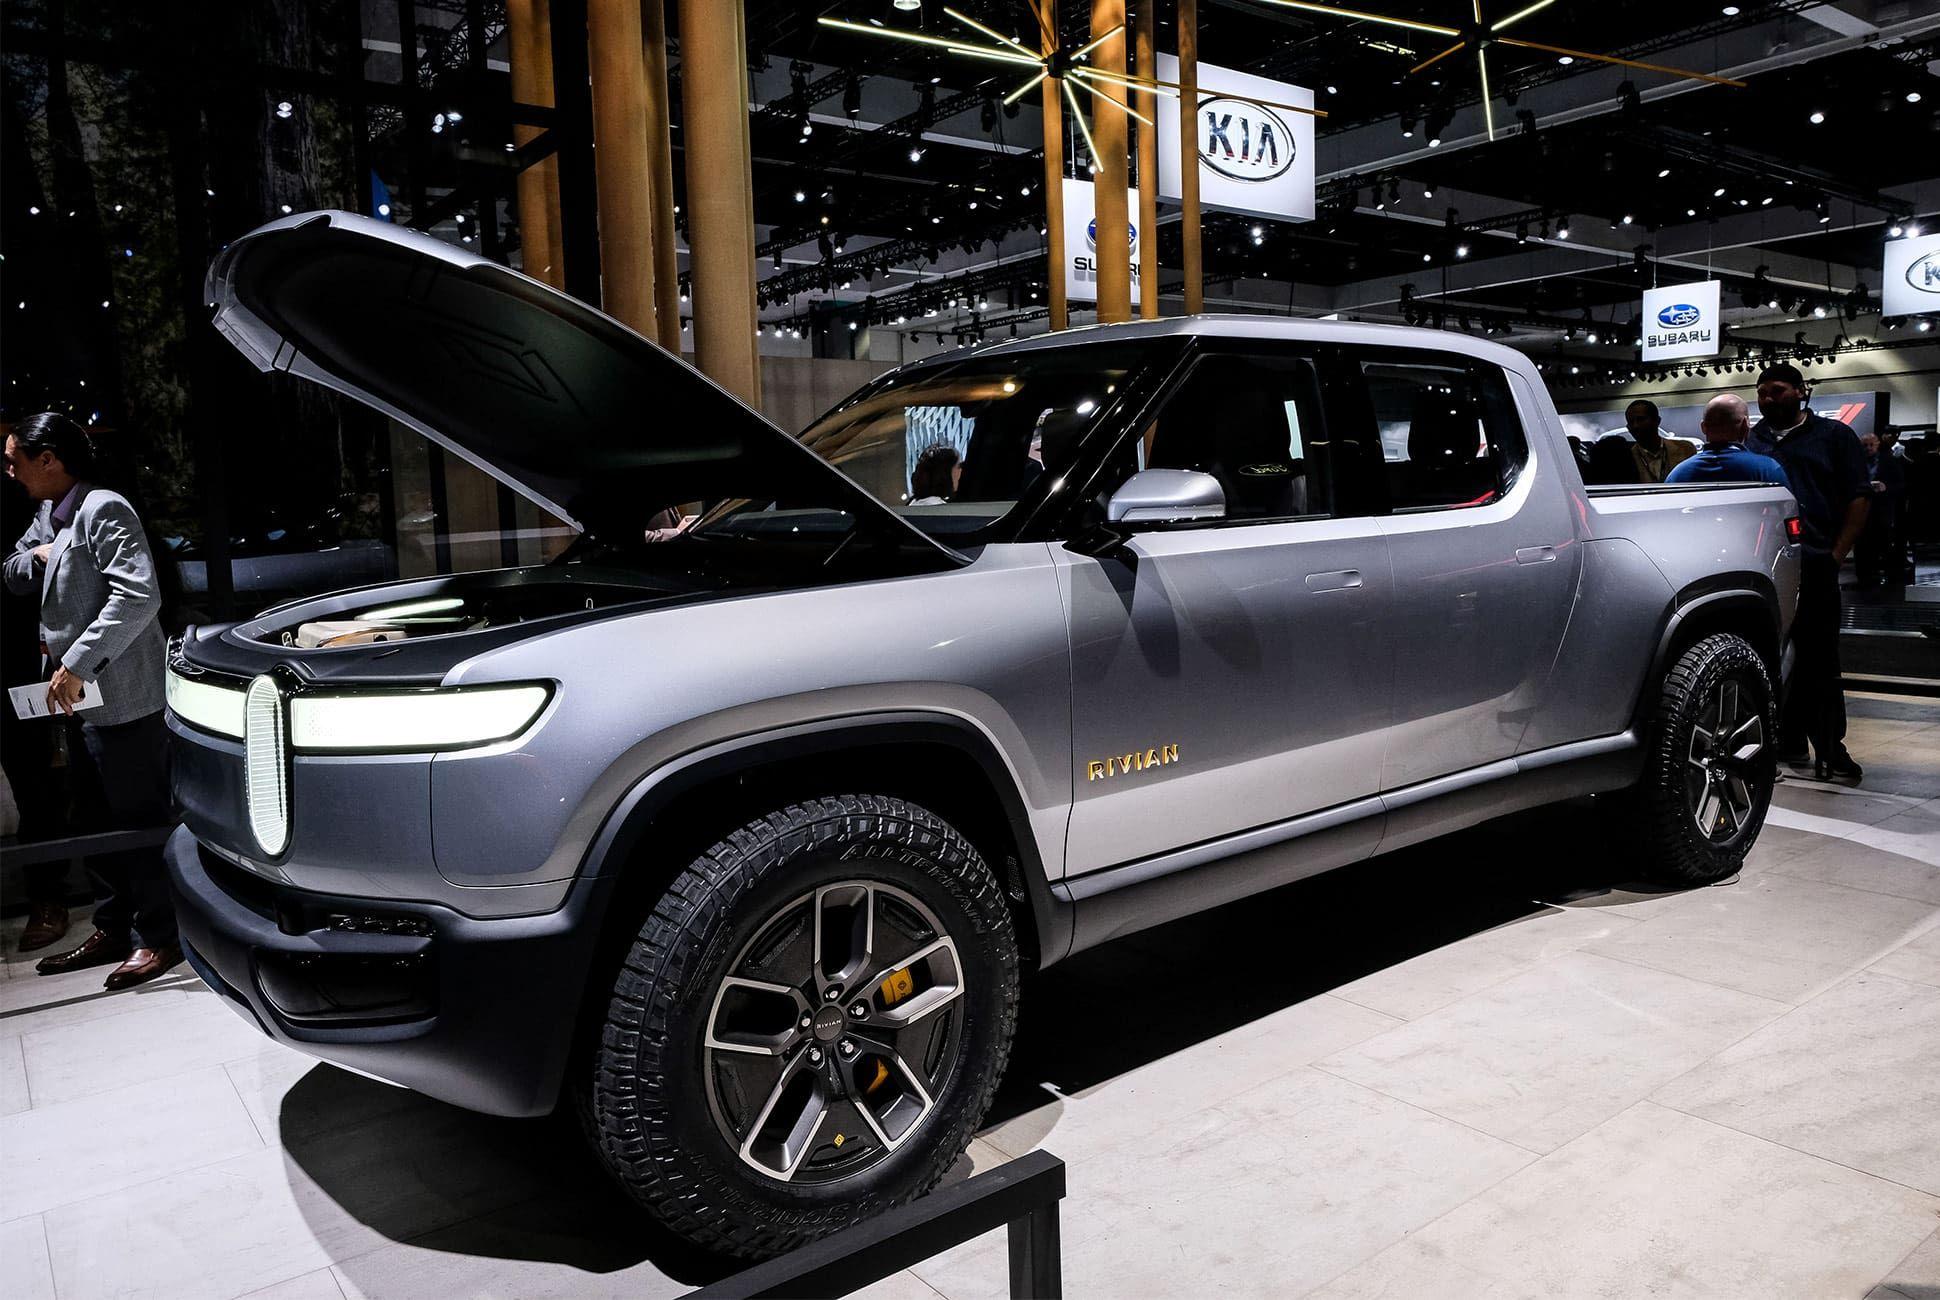 Top-10-LA-Auto-Show-Cars-gear-patrol-Rivian-R1T-R1S-slide-3